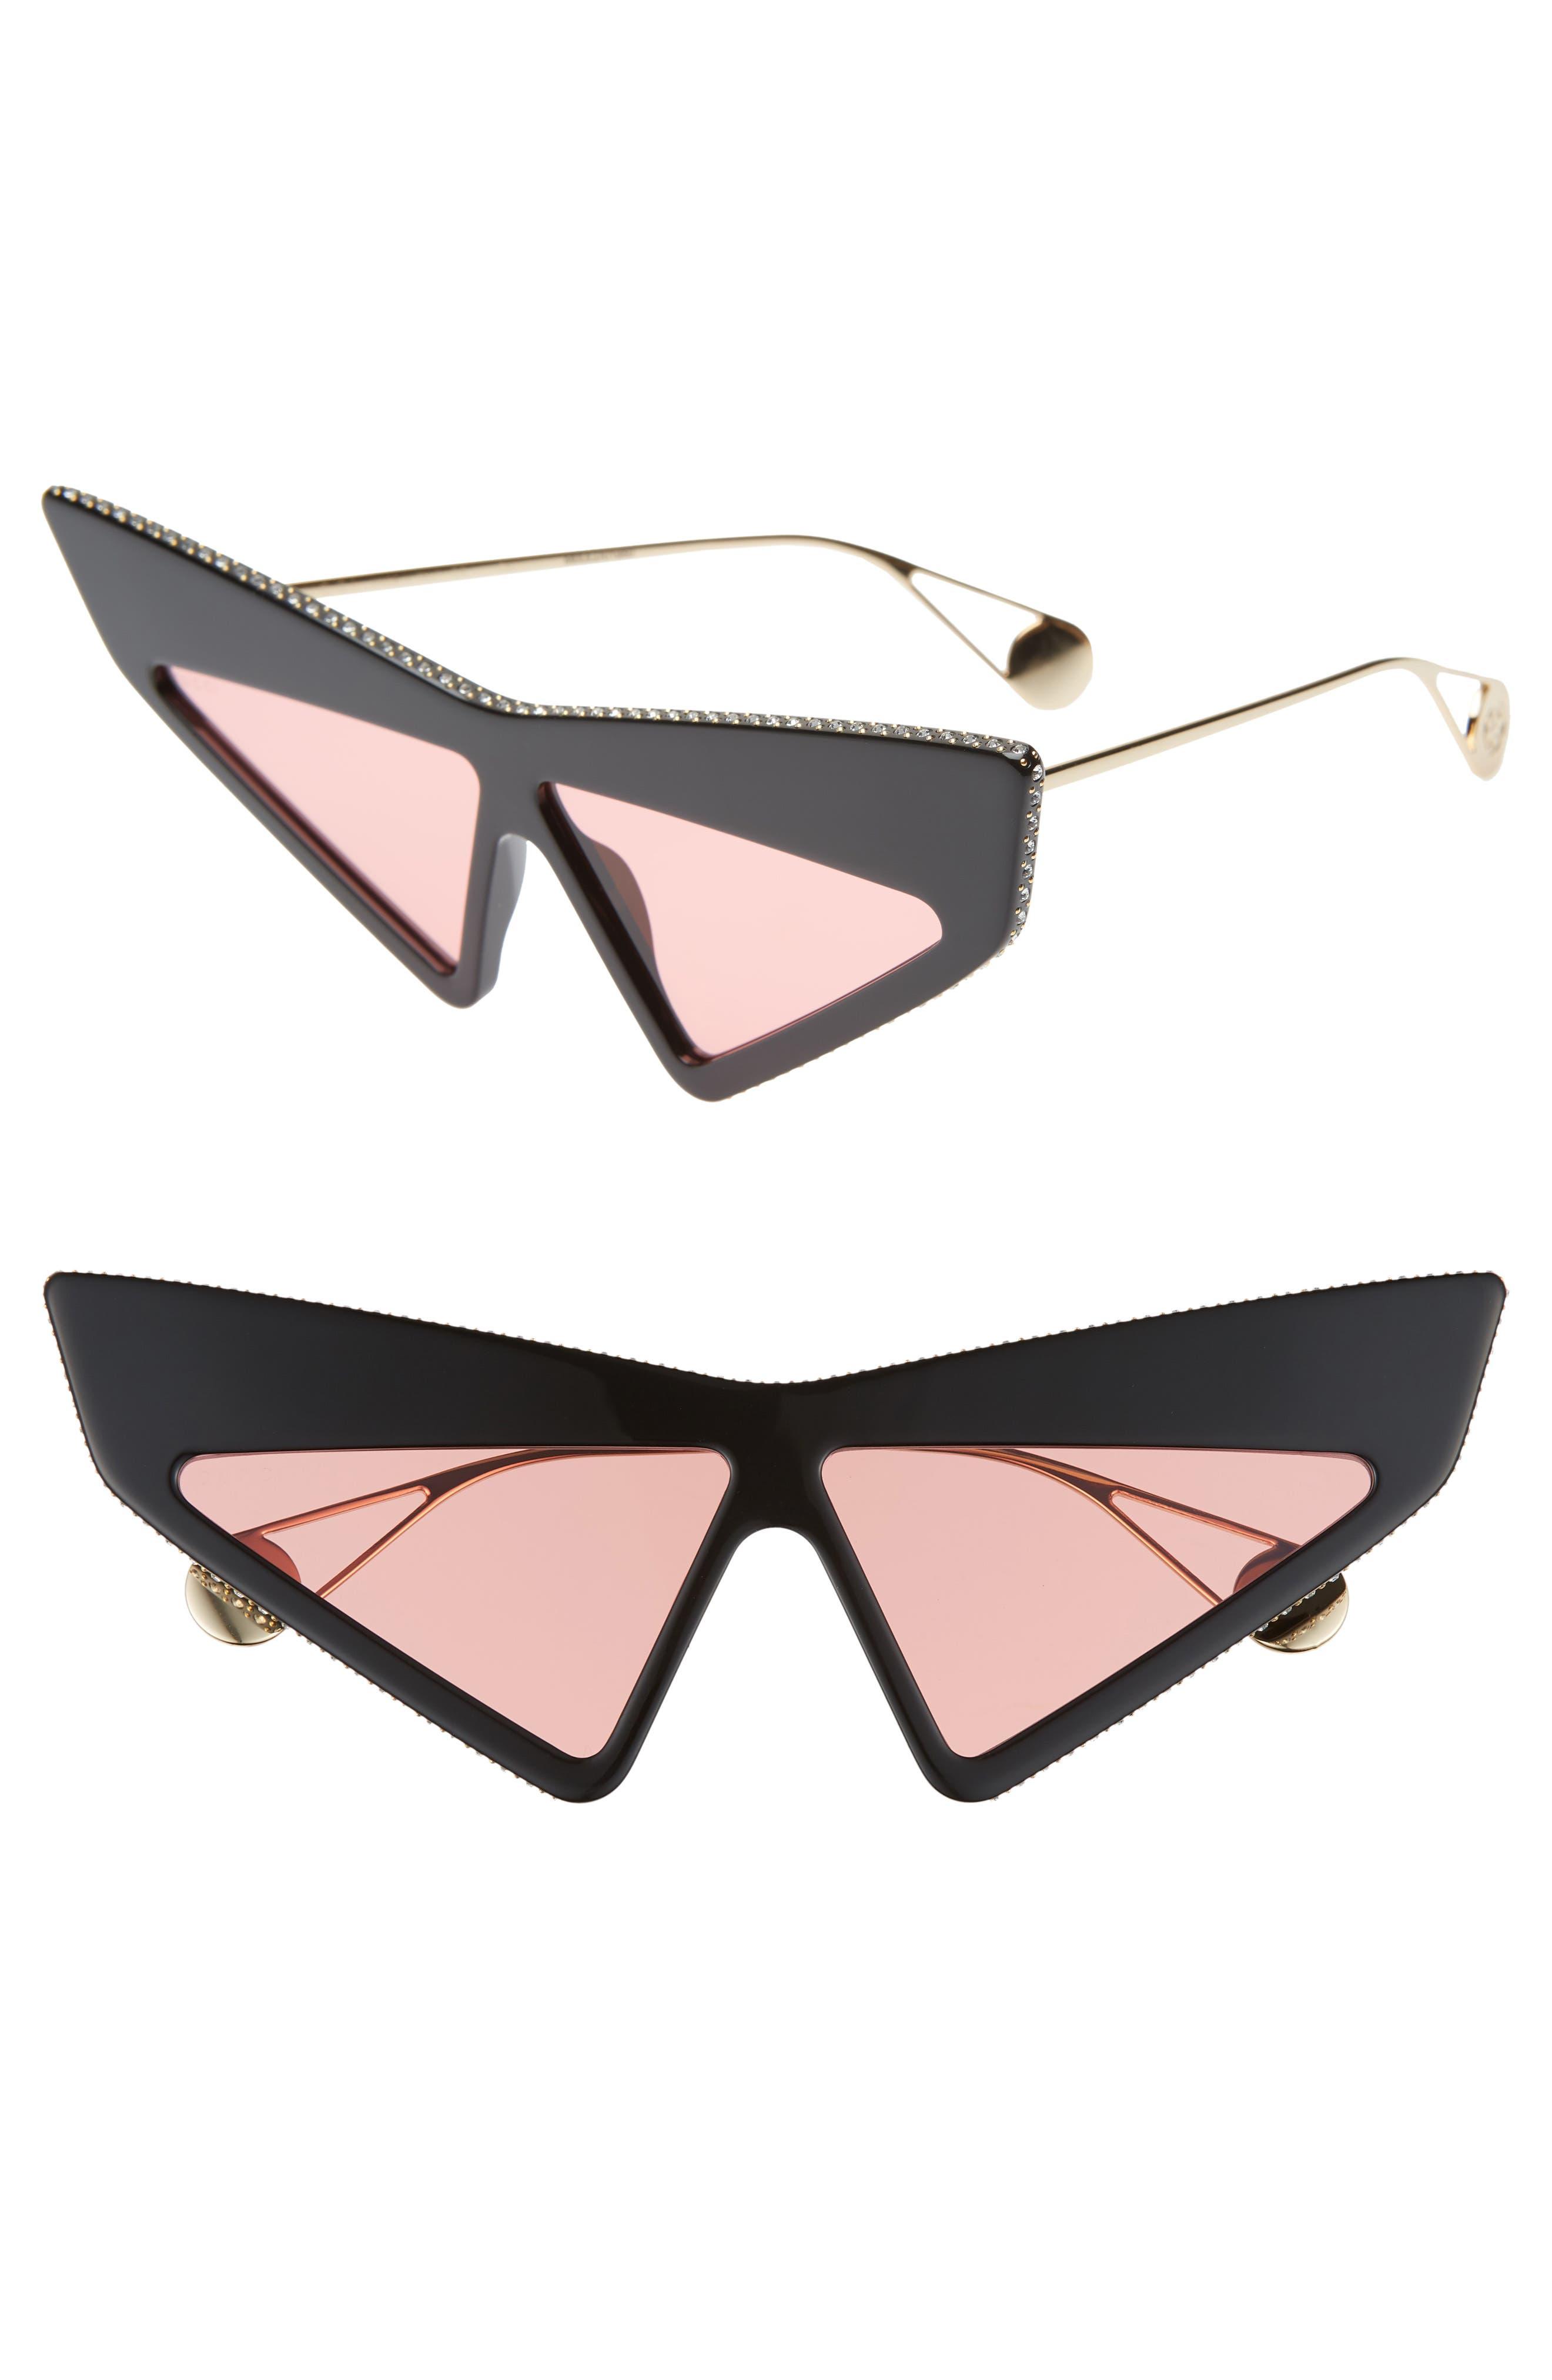 70Mm Cat Eye Sunglasses - Black/Swarovski W/Solid Cherry